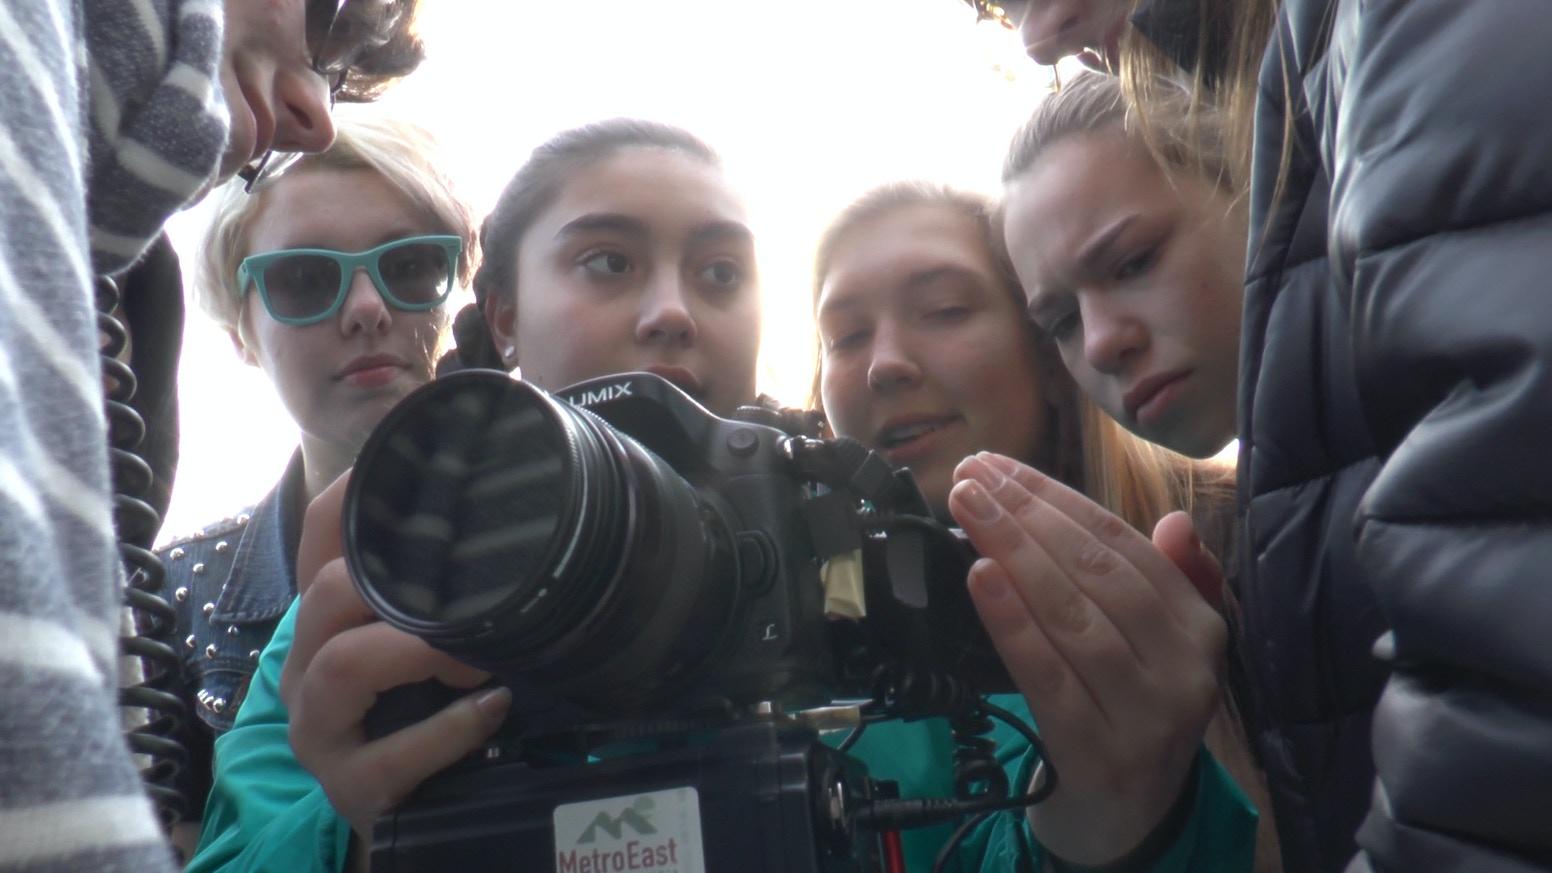 POWGirls Media Education Program - Help fund youth-created media!